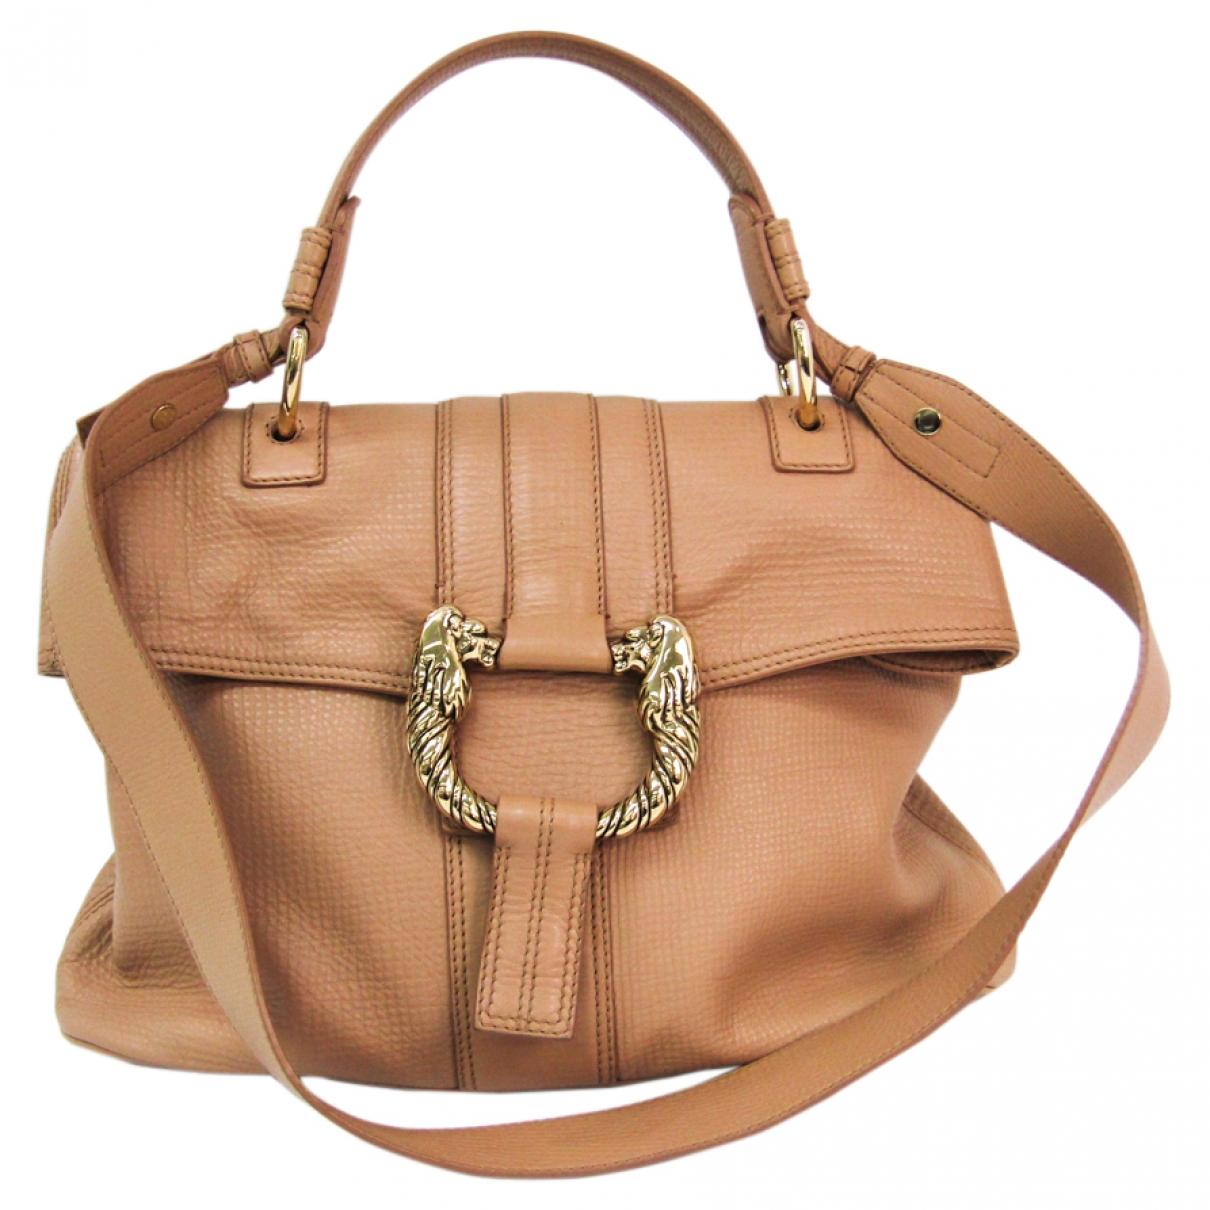 Bvlgari \N Pink Leather handbag for Women \N